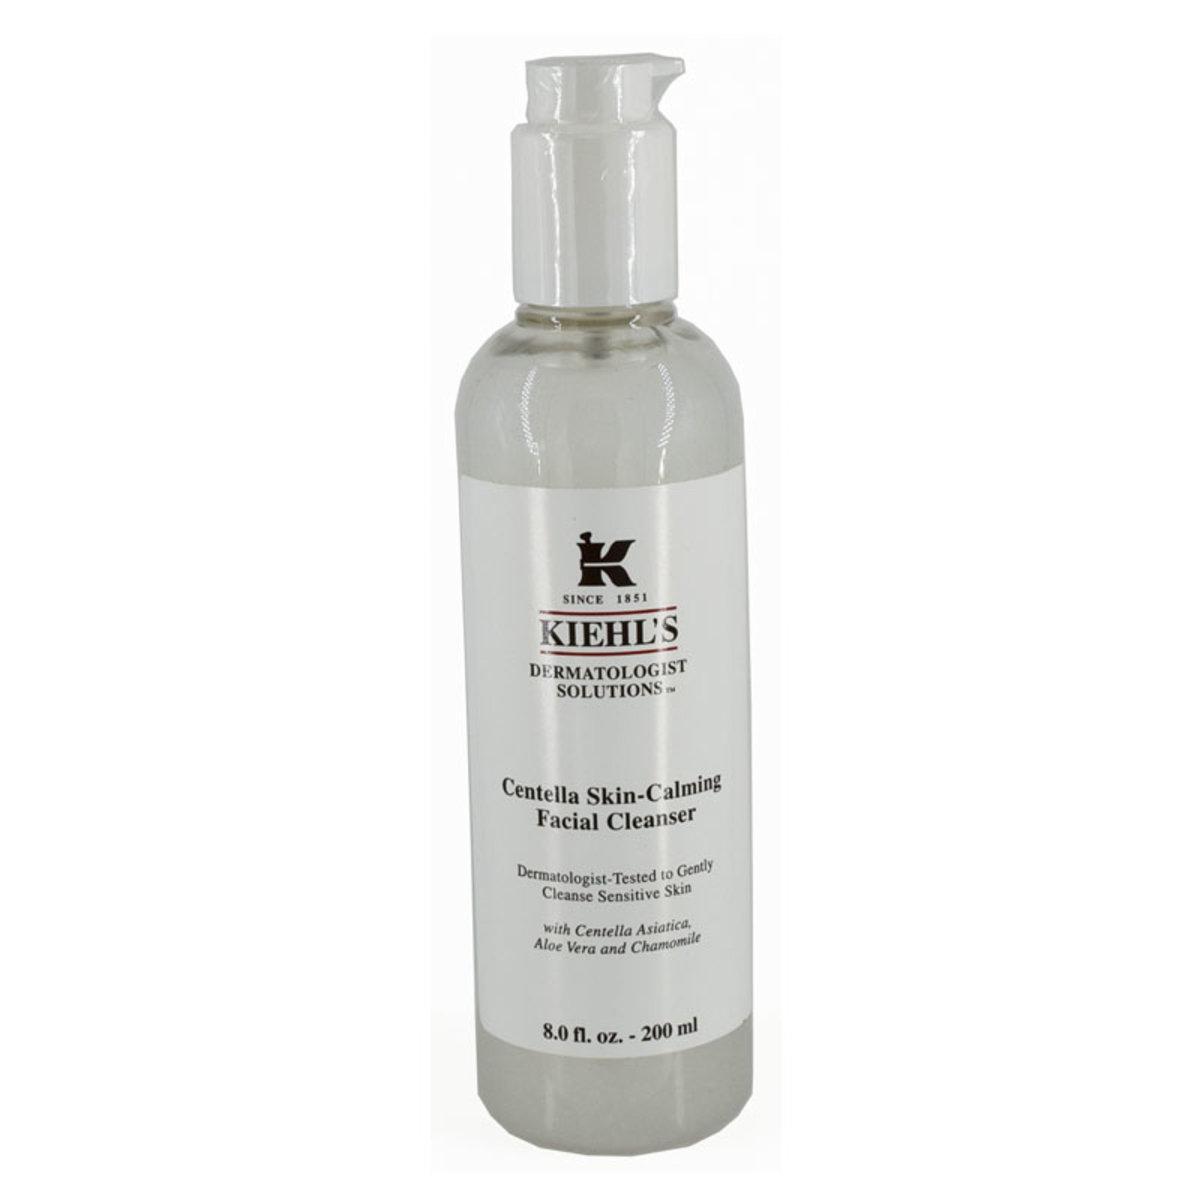 Centella Skin-Calming Facial Cleanser 200ml